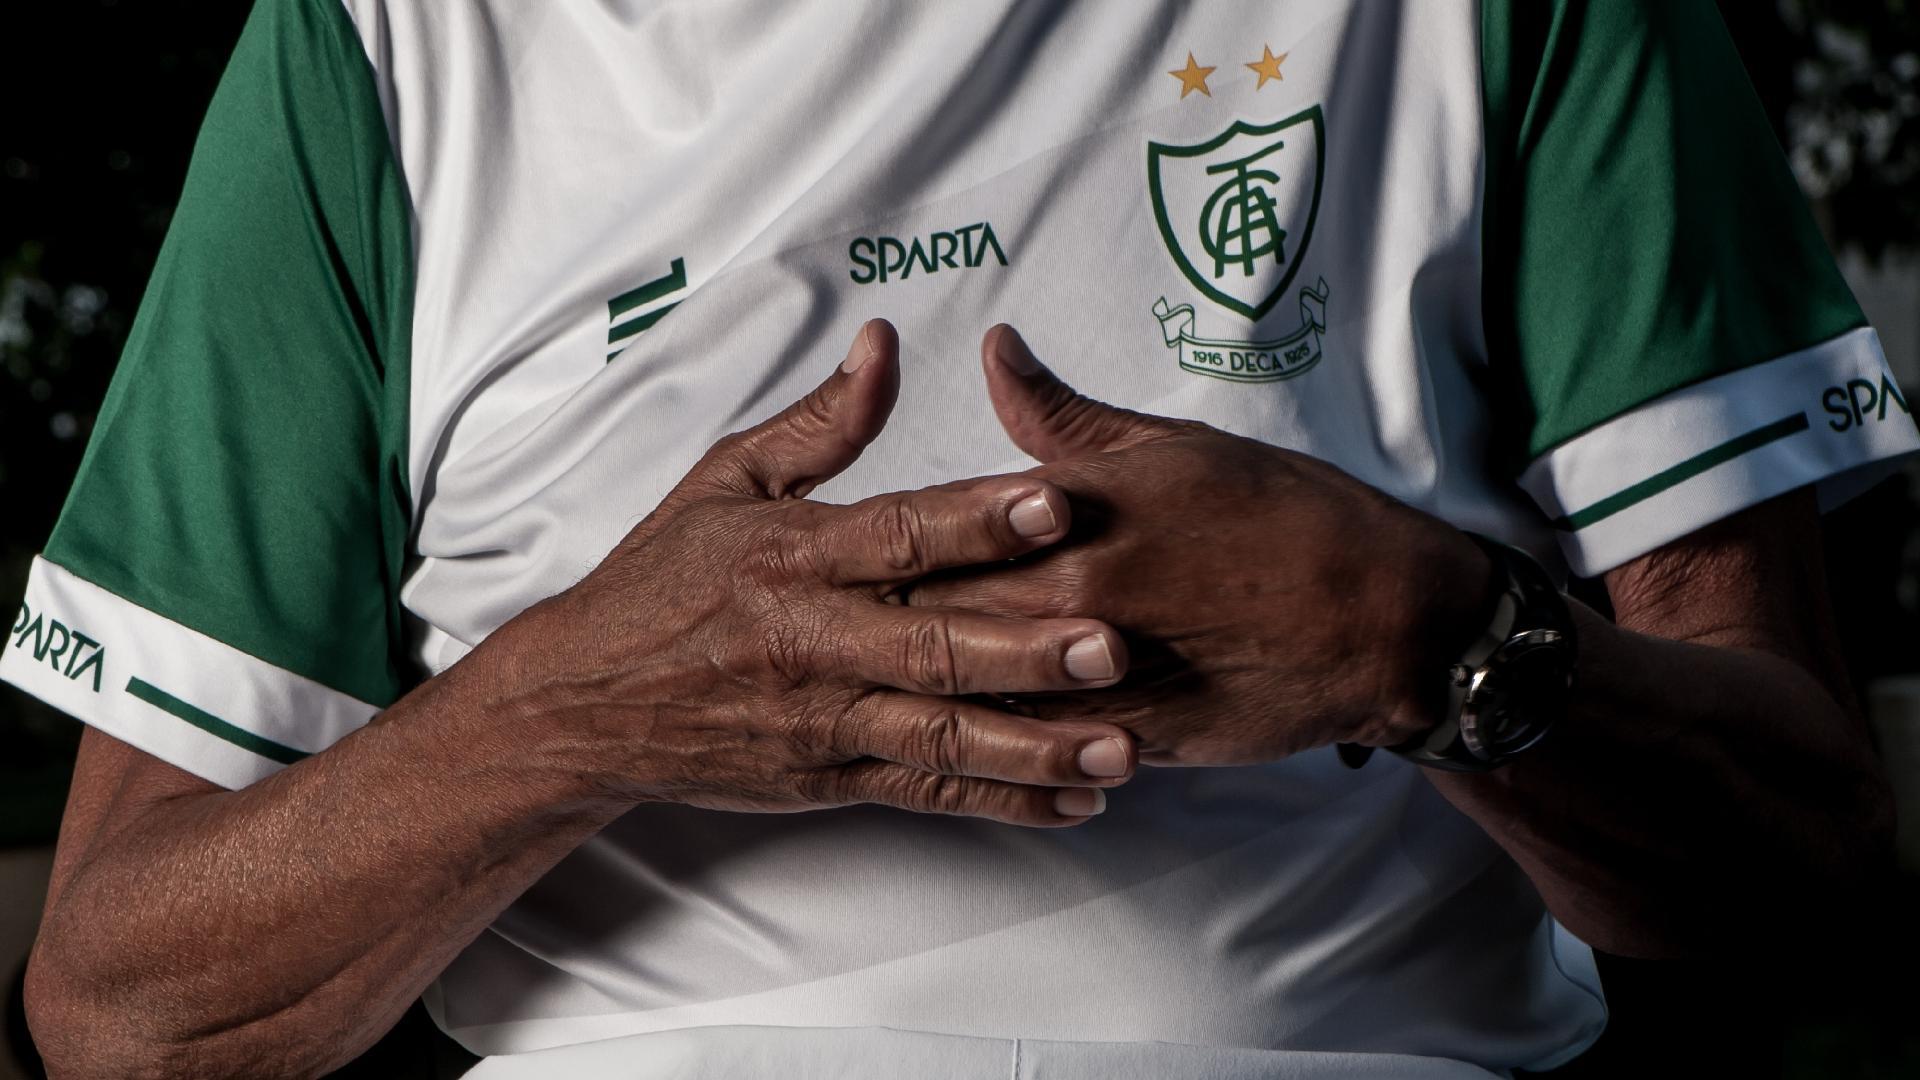 Alexandre Rezende/UOL